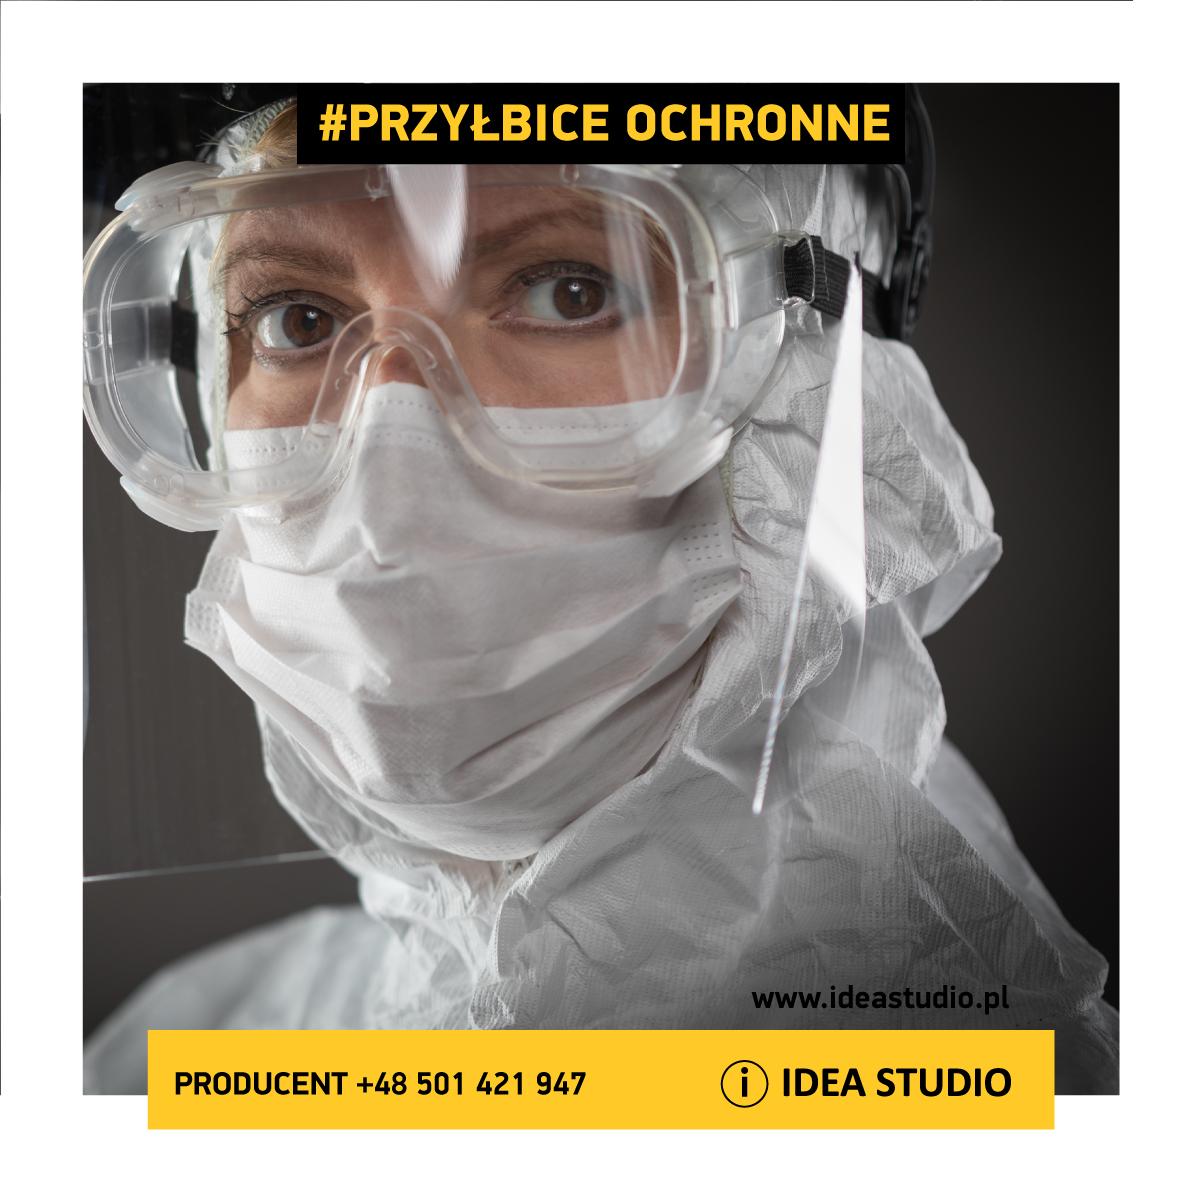 Przyłbica ochronna | Producent Ideastudio.pl